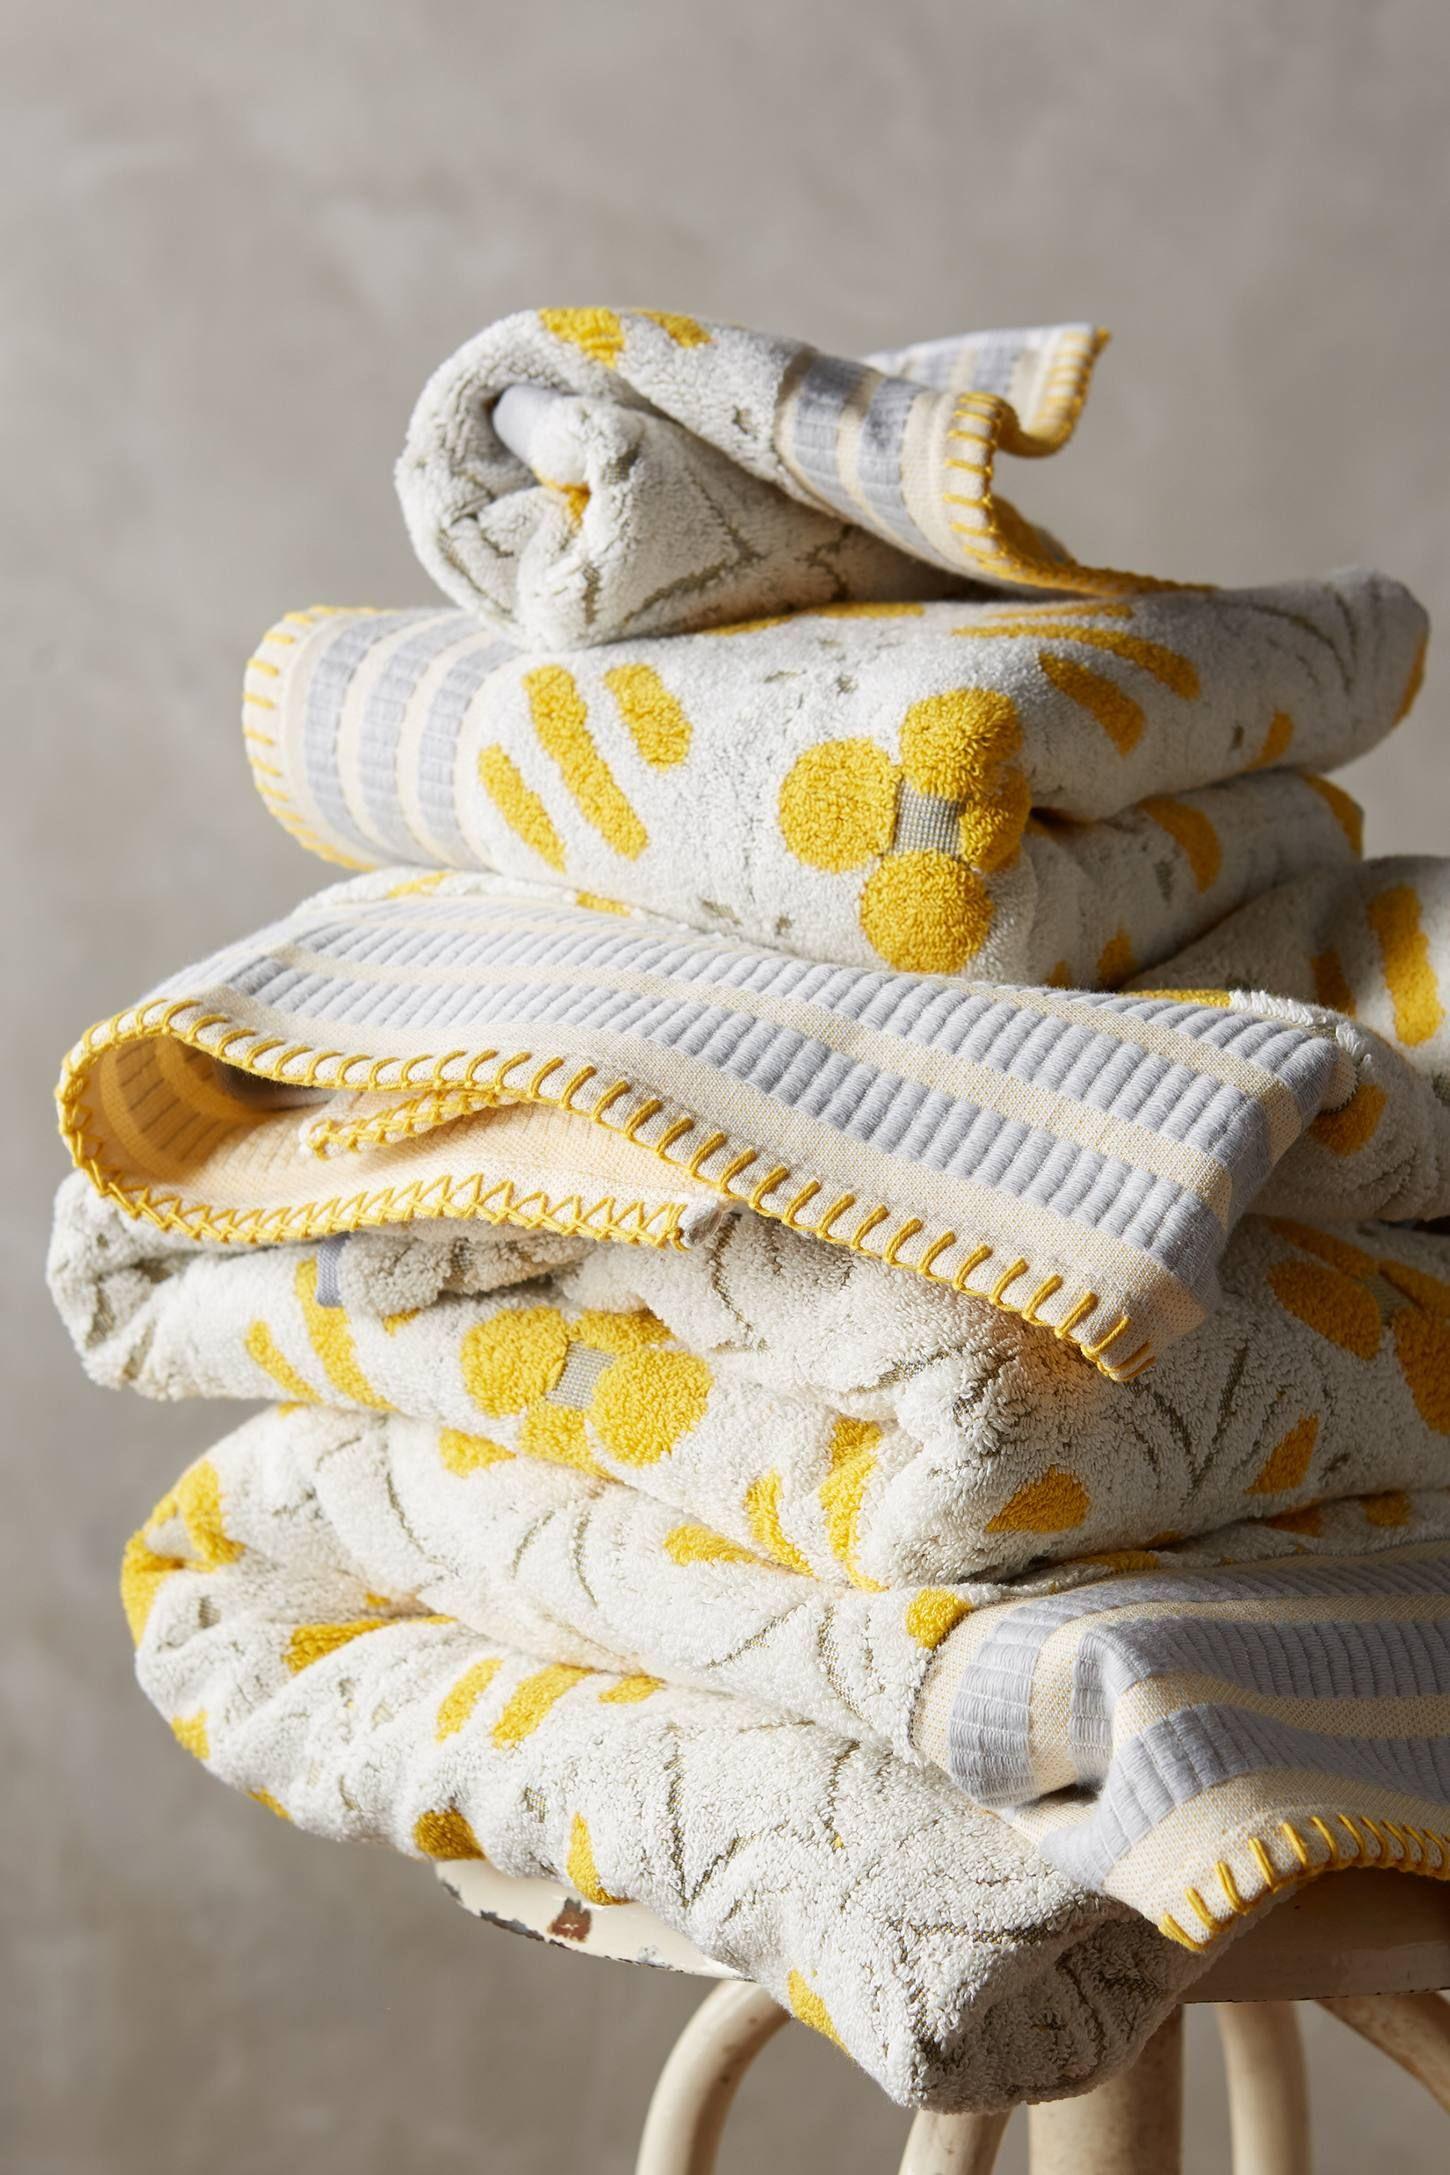 Piastrella Towel Collection